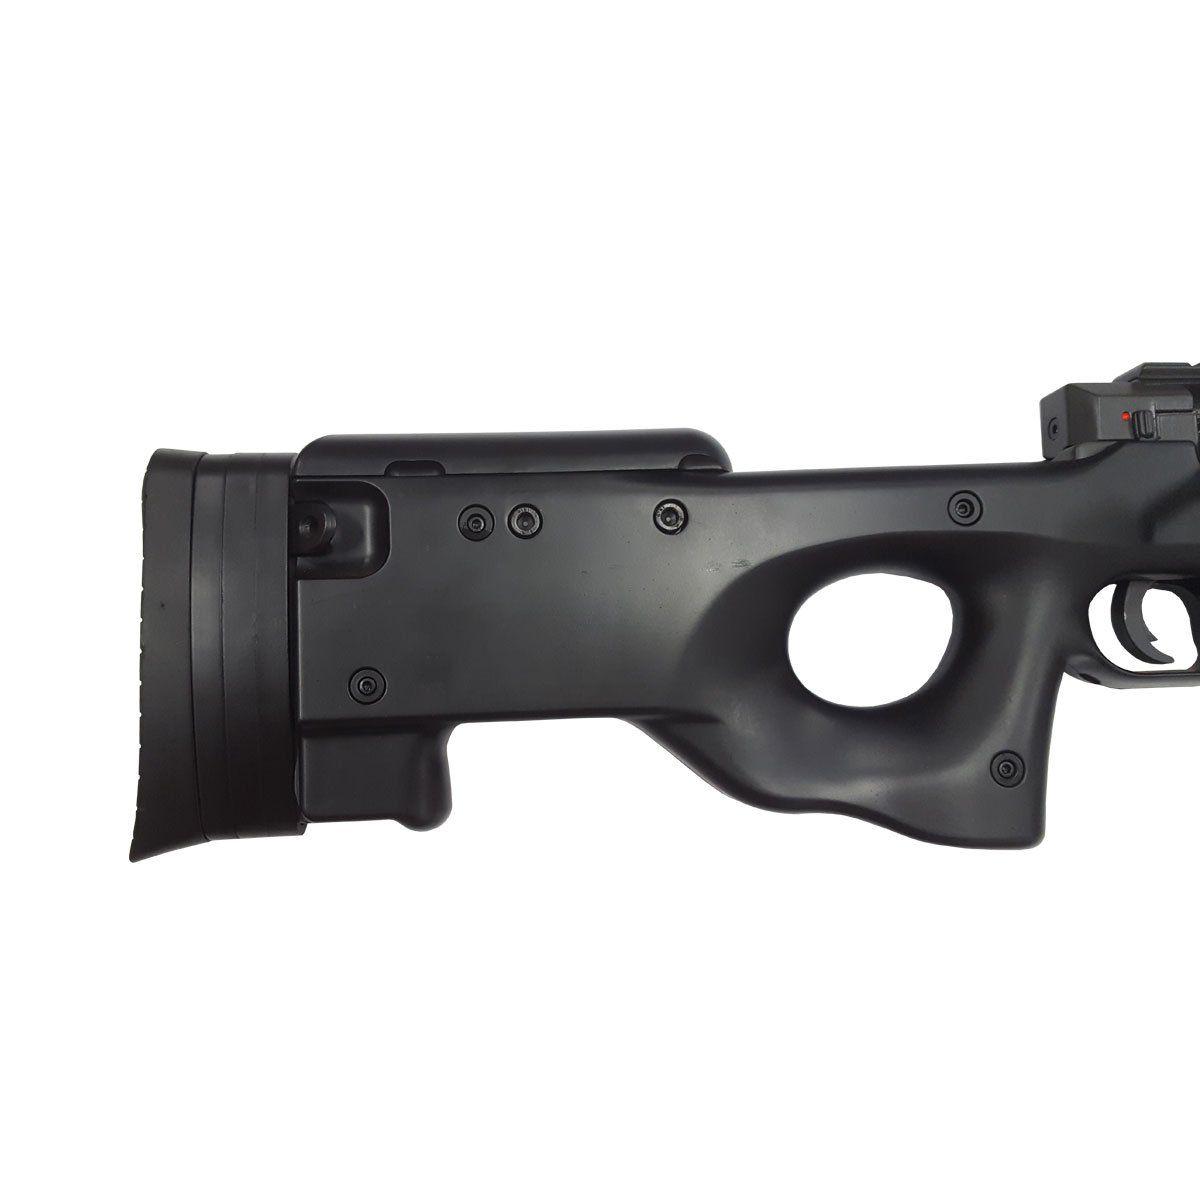 Sniper de Airsoft Well L96 AWP MB01 Bolt Action Spring 6mm